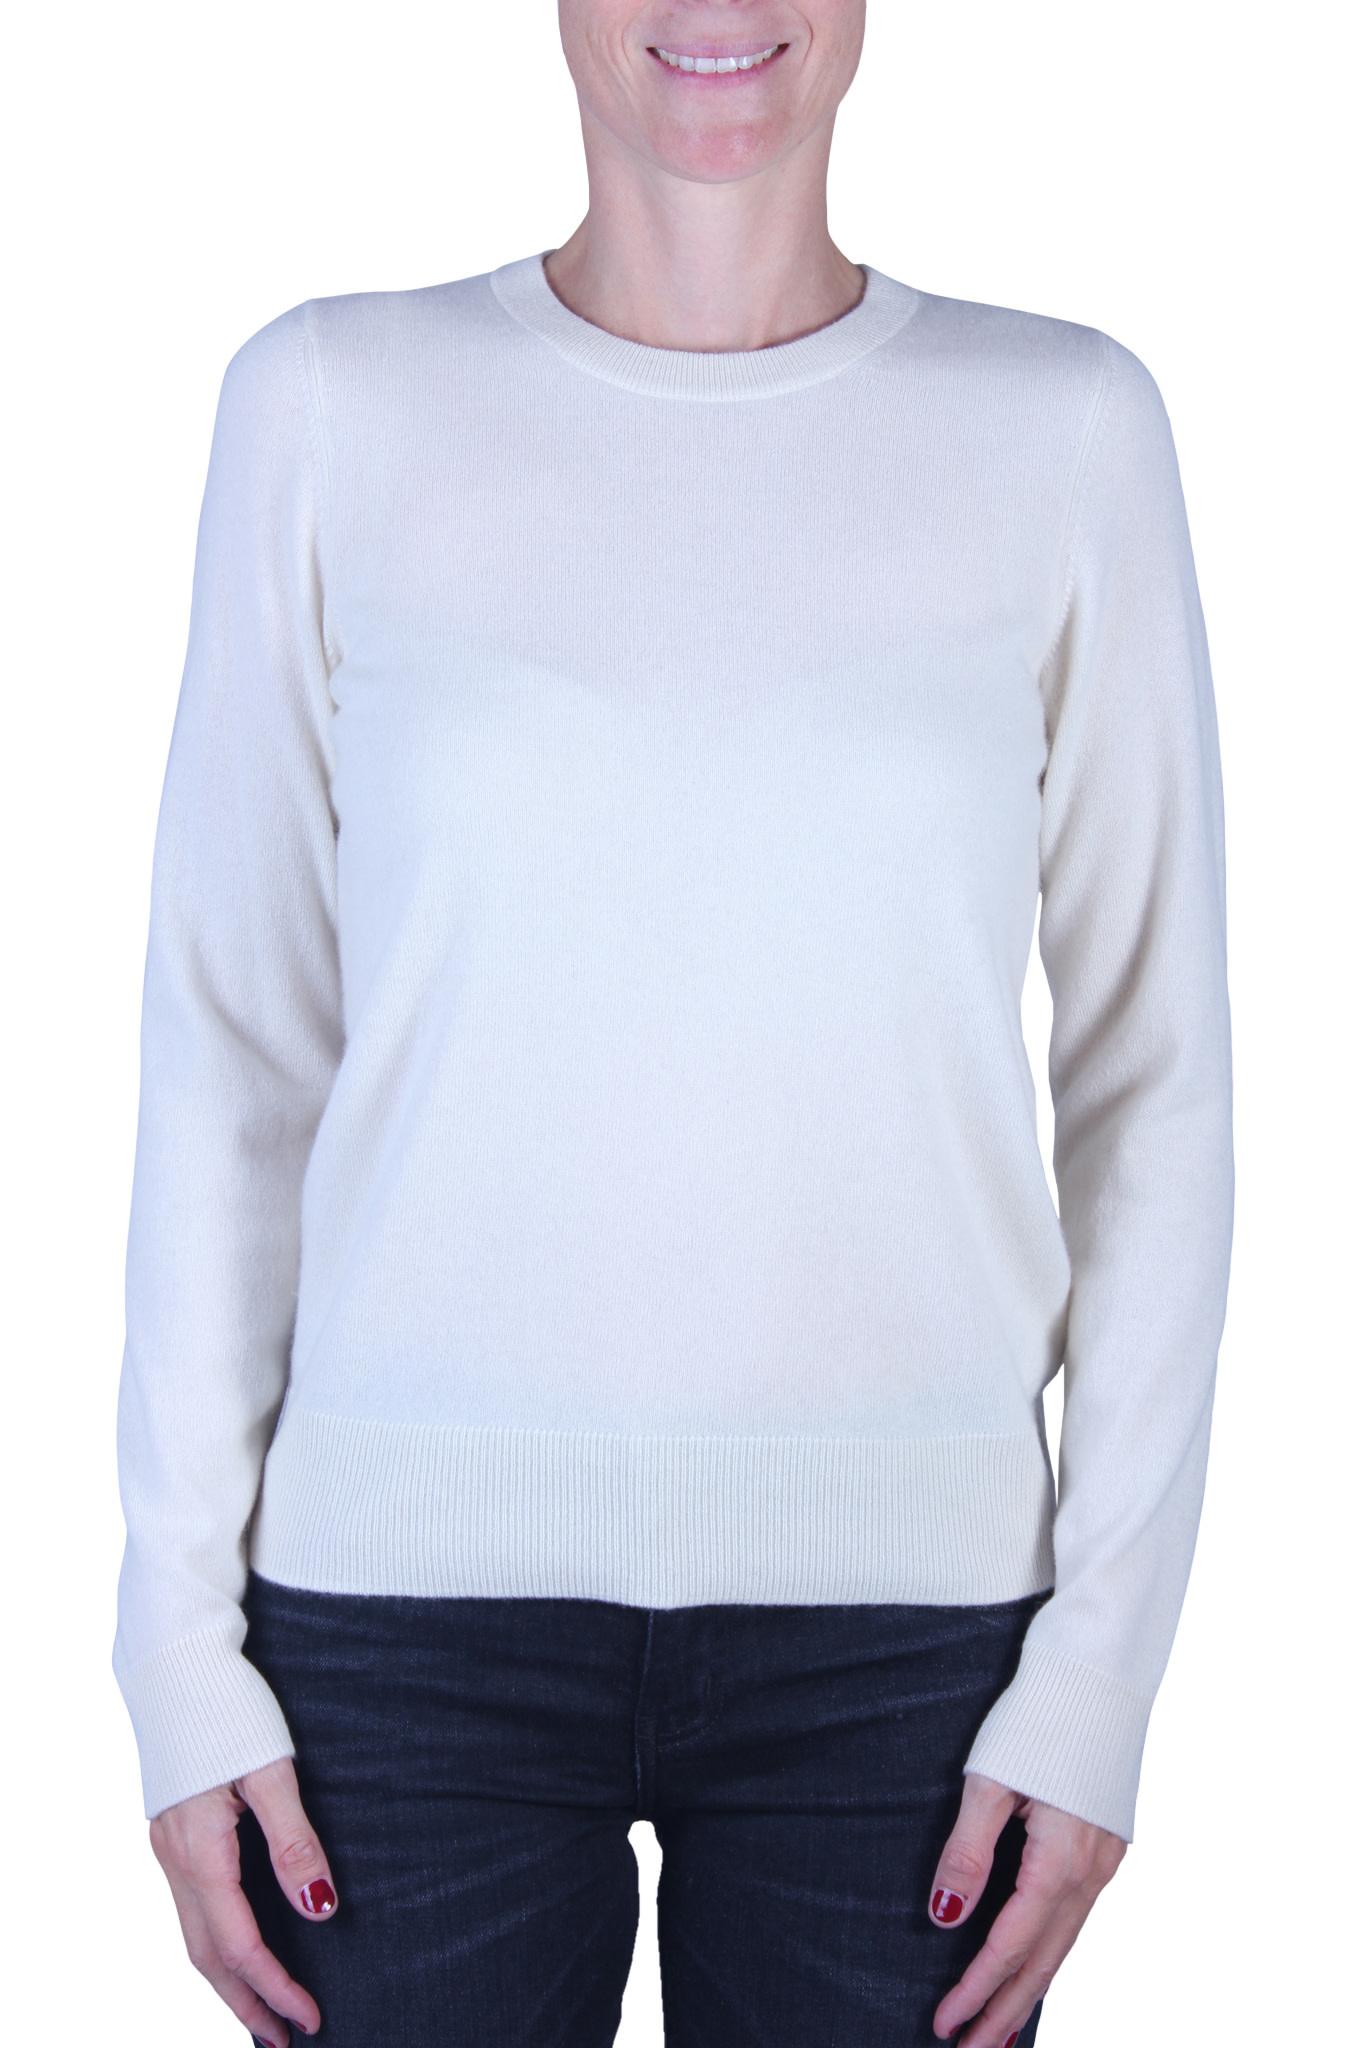 Repeat Sweater 100413-3